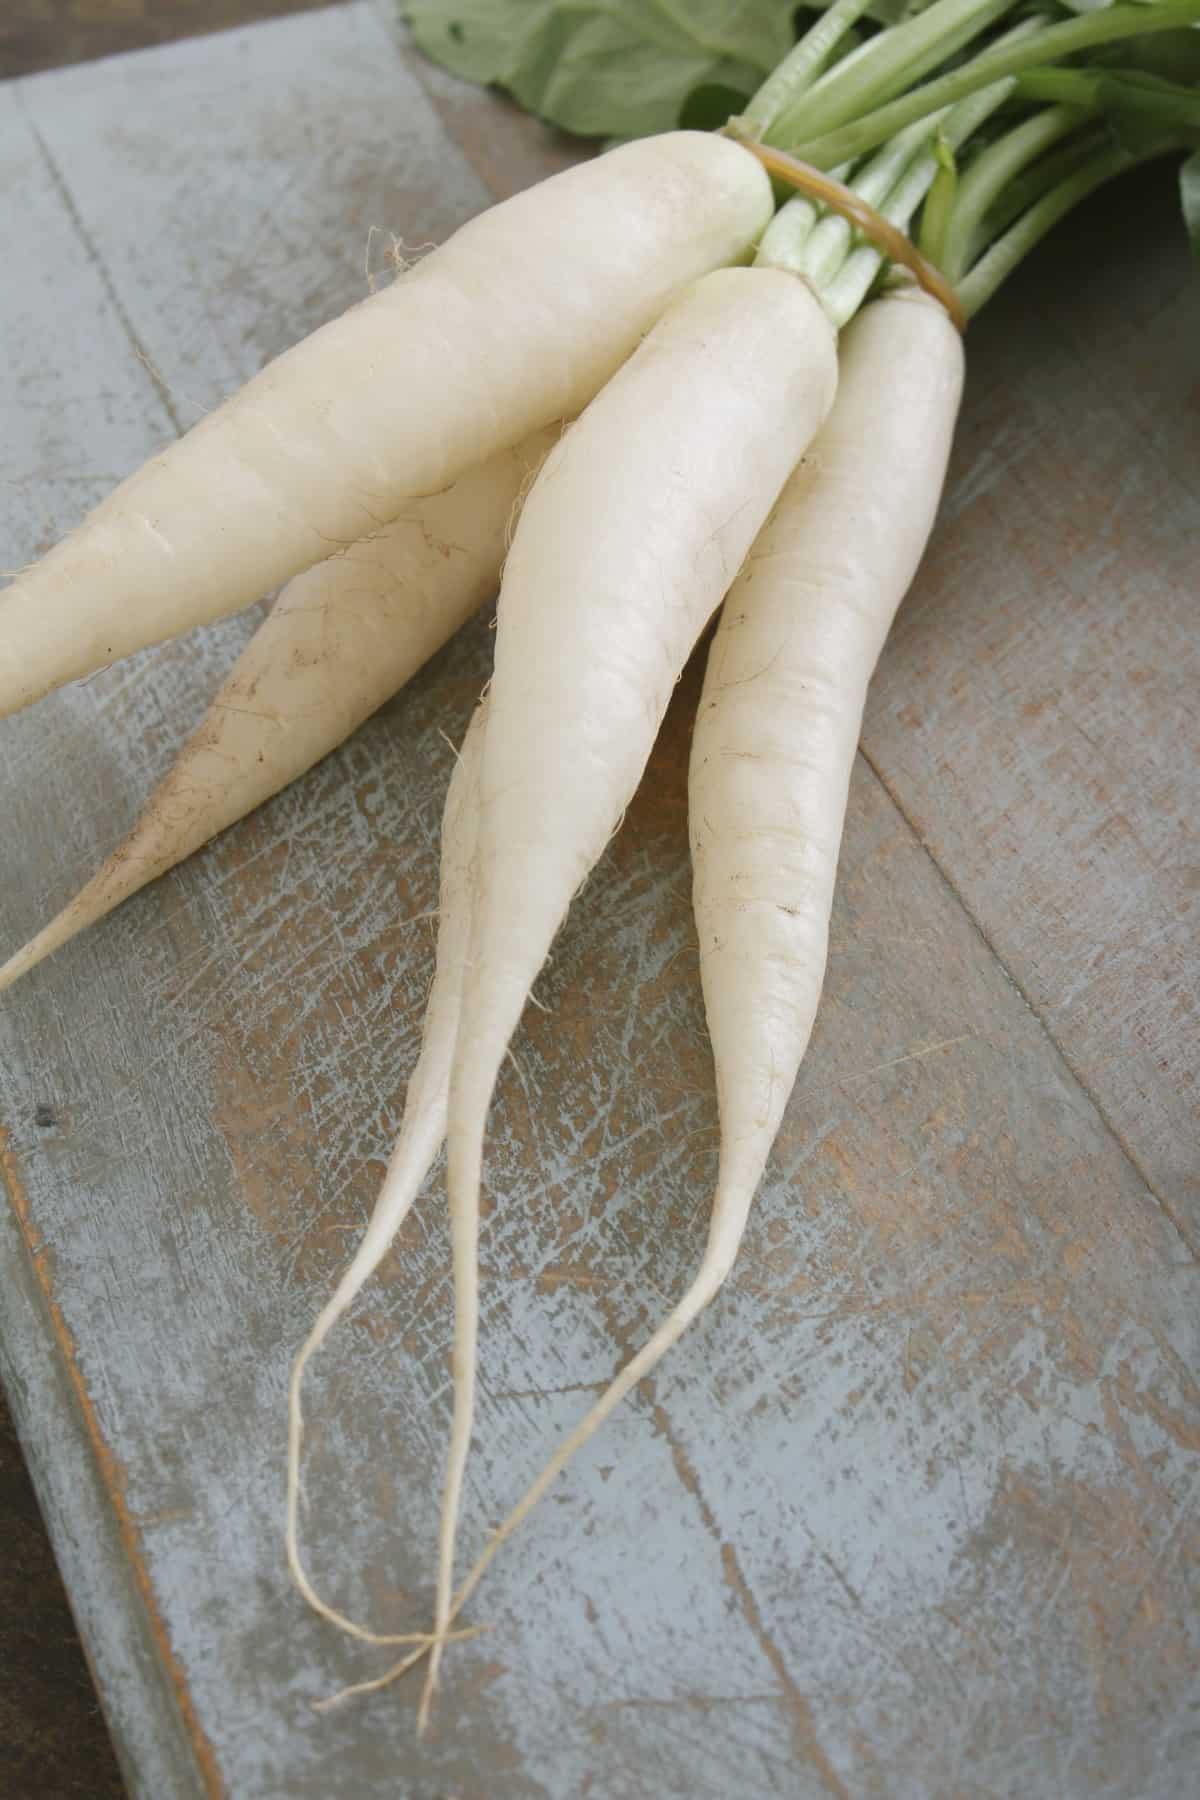 Bunch of white daikon radish